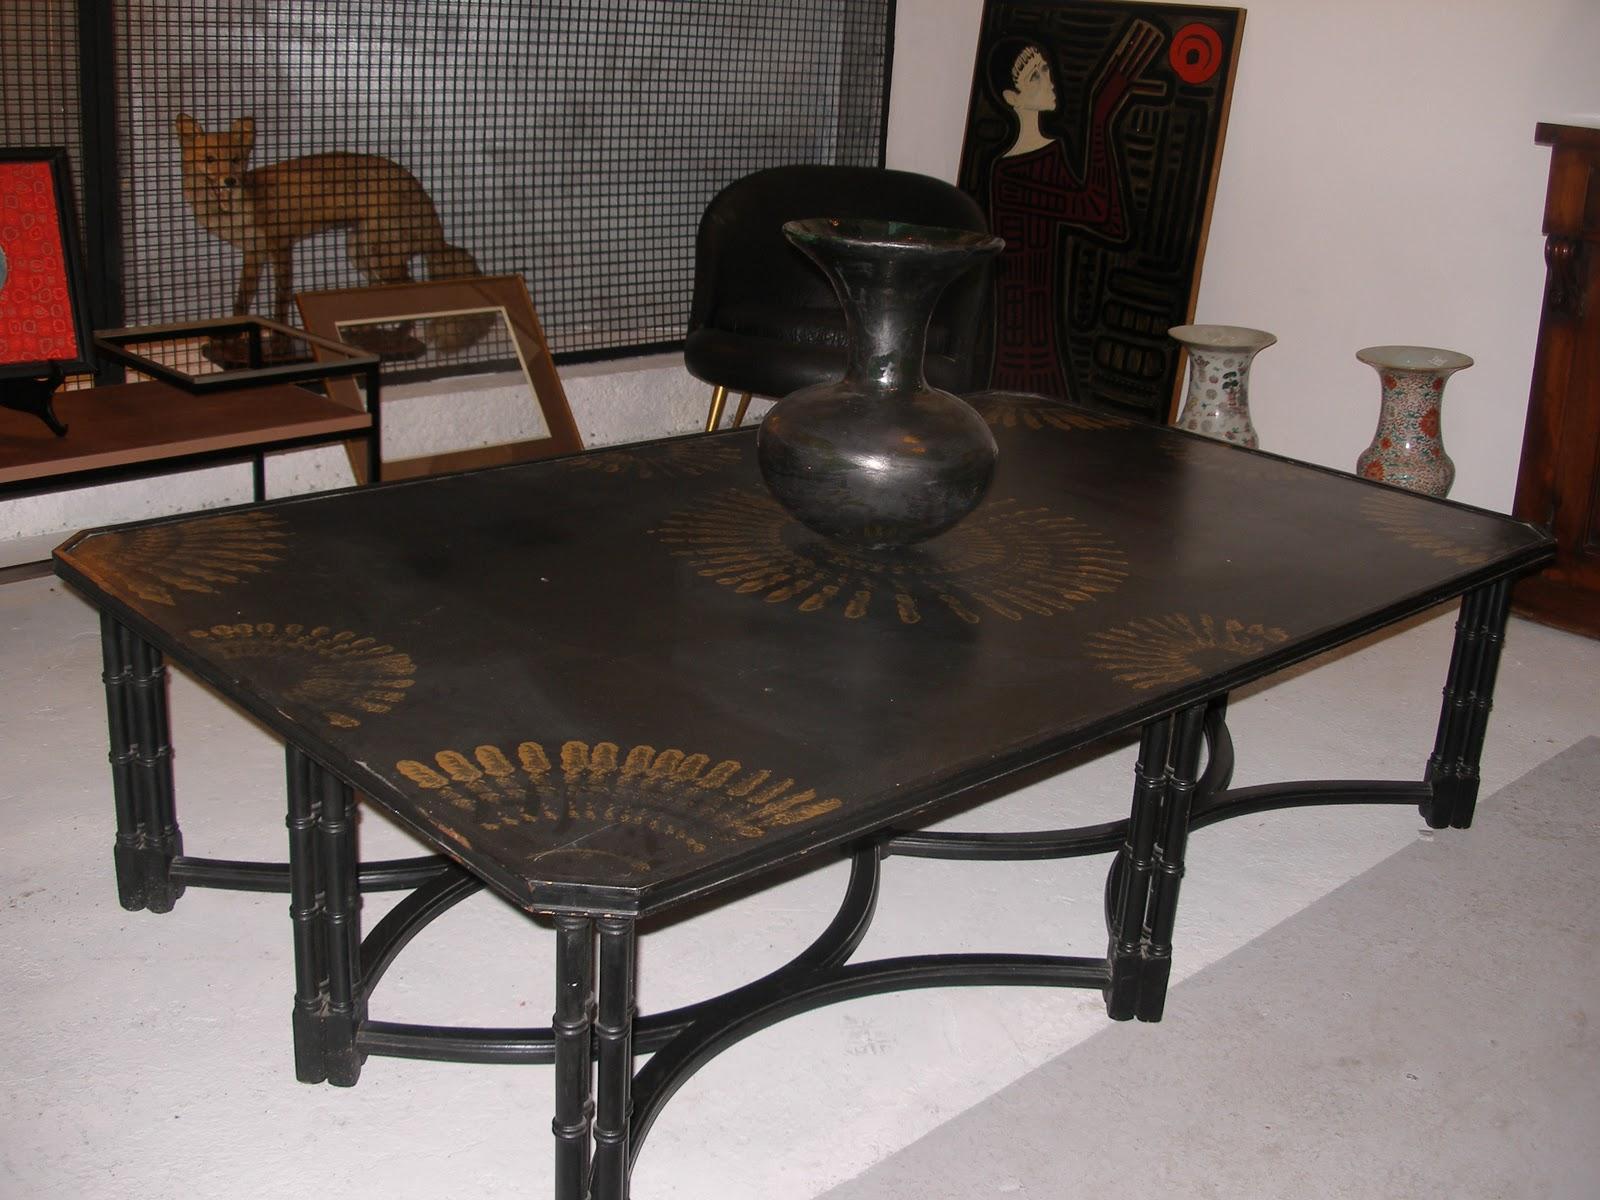 antiquites rachida dekoumi table basse decoration xx. Black Bedroom Furniture Sets. Home Design Ideas